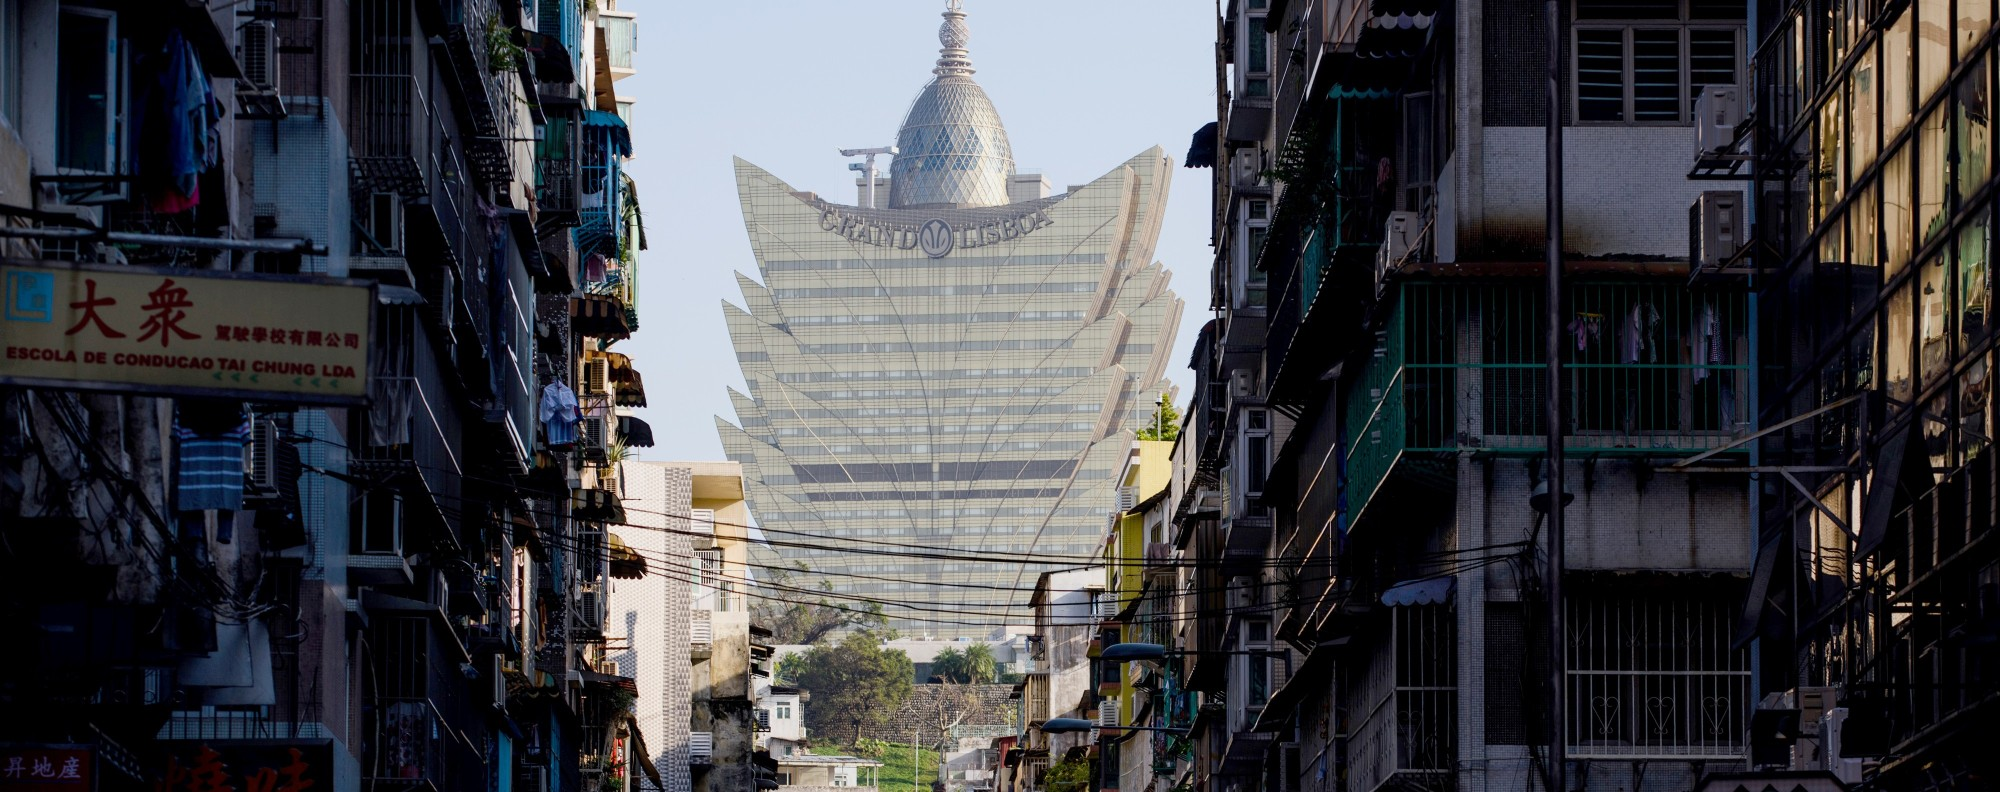 The Grand Lisboa casino in Macau. Photo: AFP